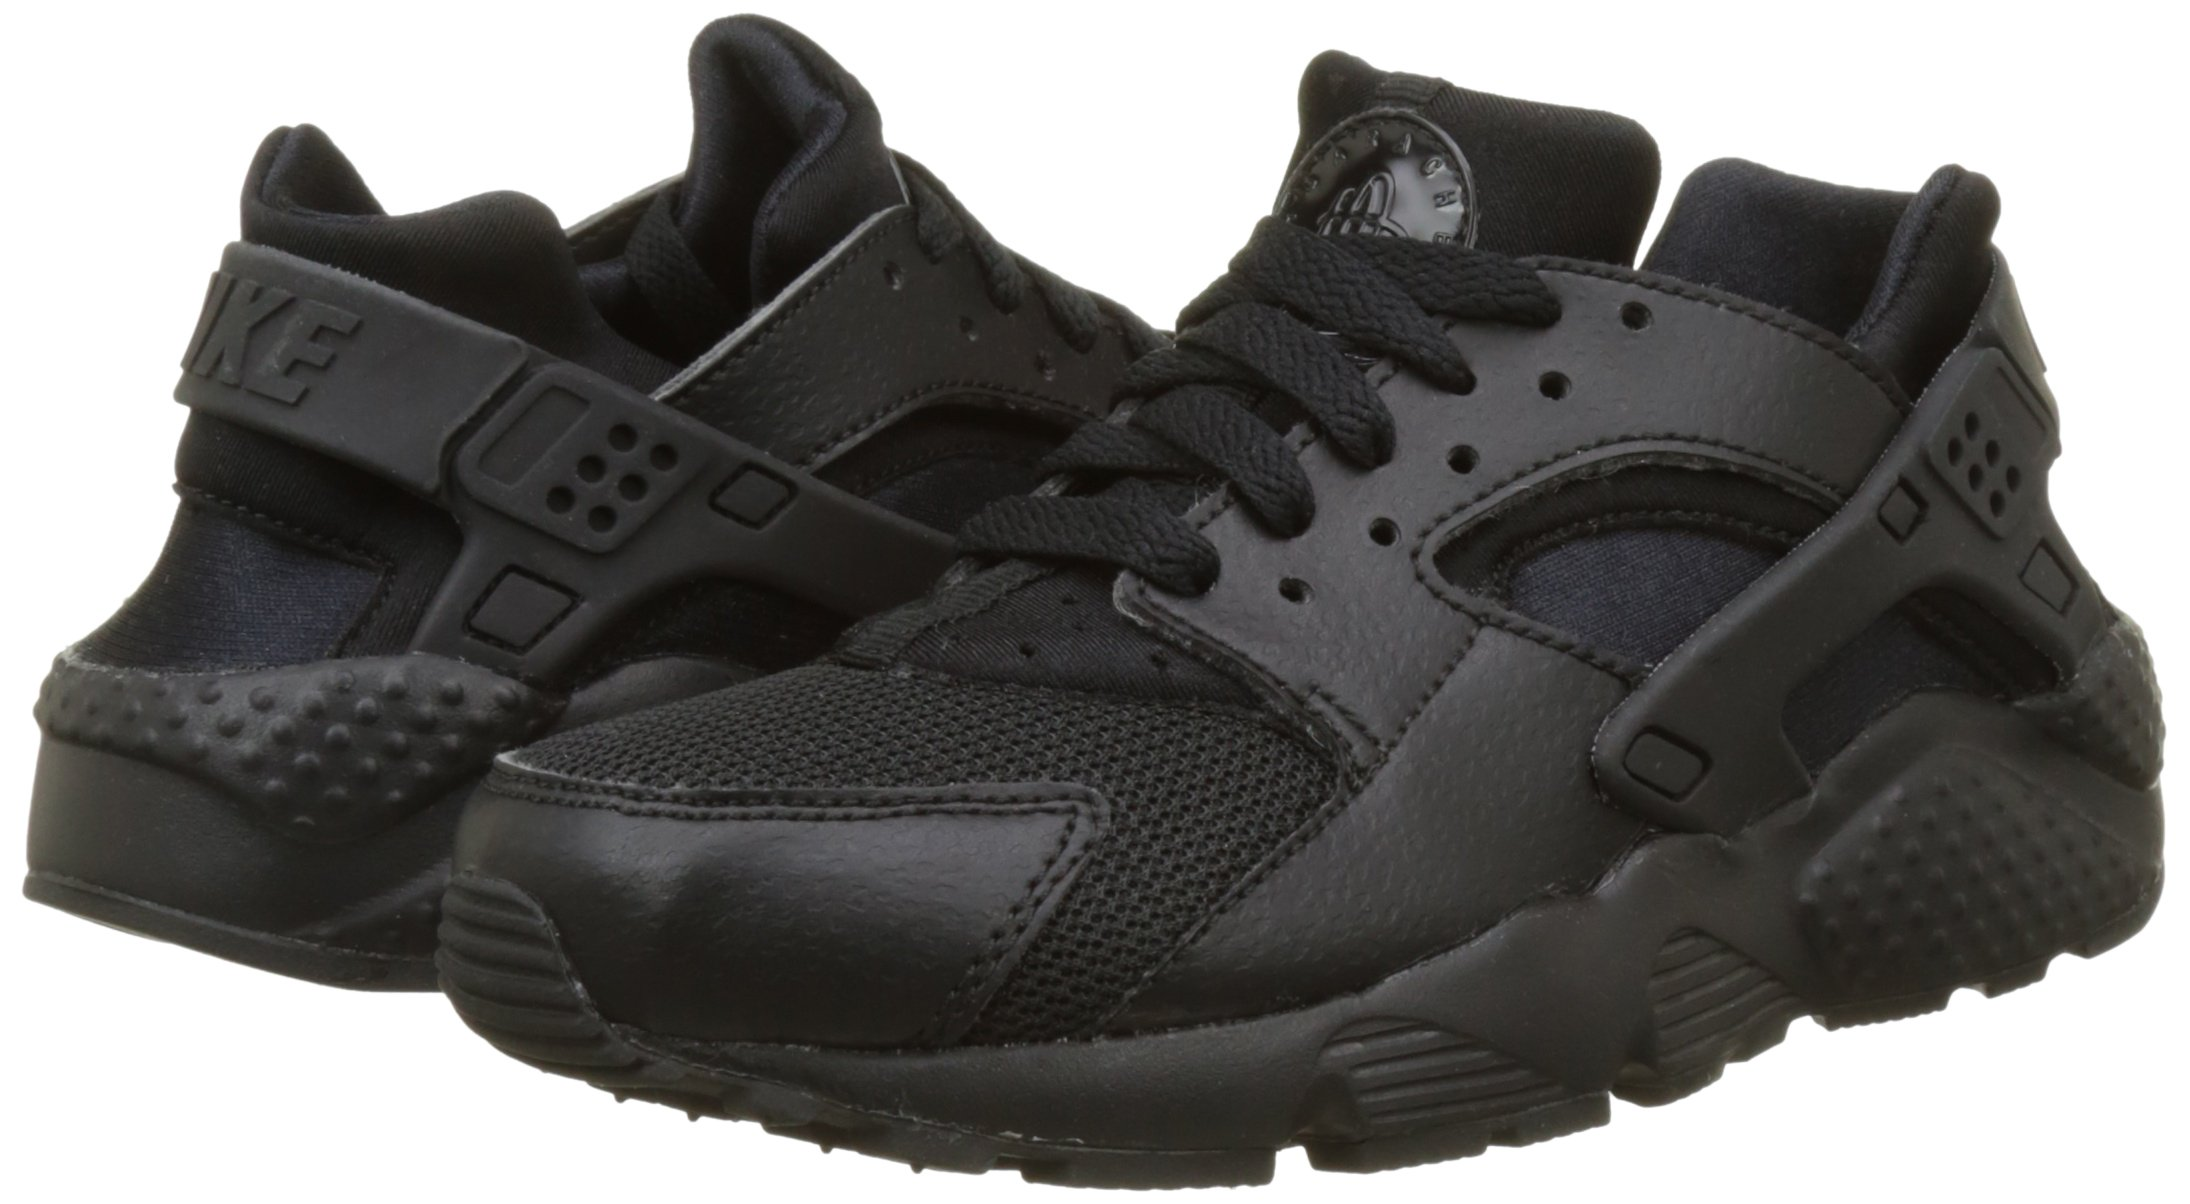 71aRfX12TdL - Nike Huarache Run (GS), Boys' Running Shoes